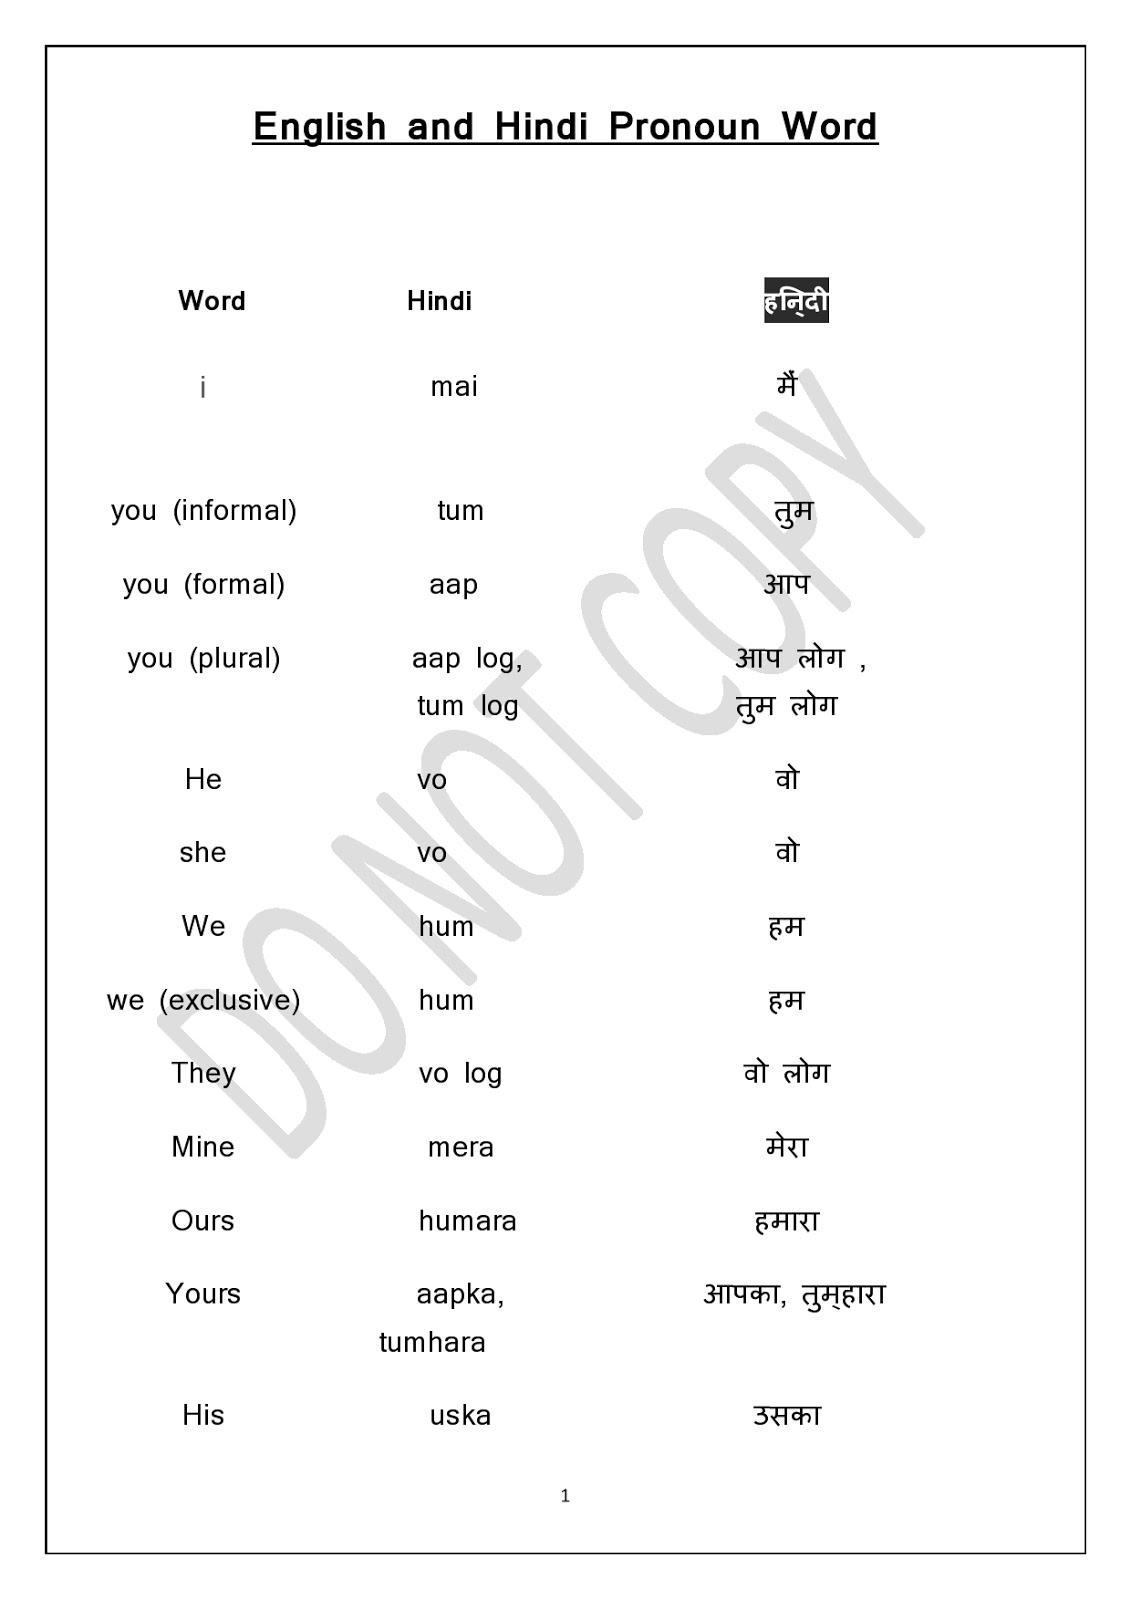 Pronoun Word English With Hindi